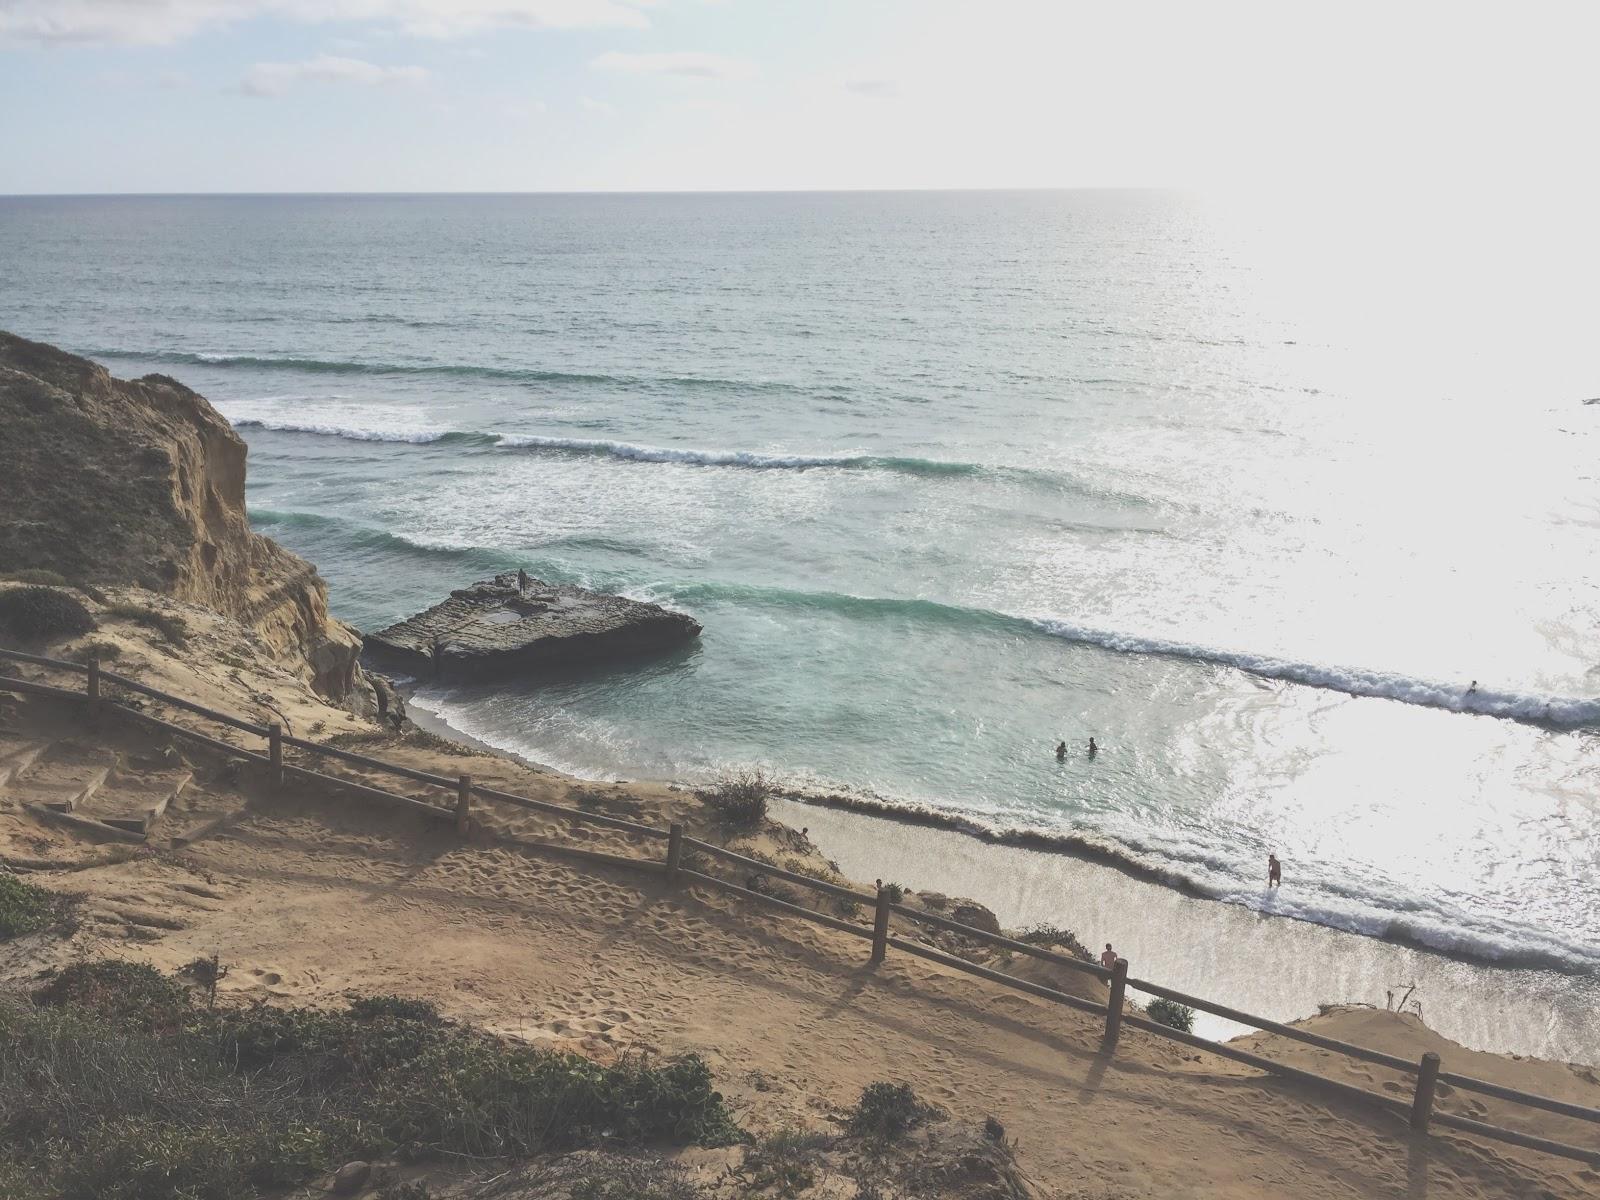 Cliffs and beaches in San Diego